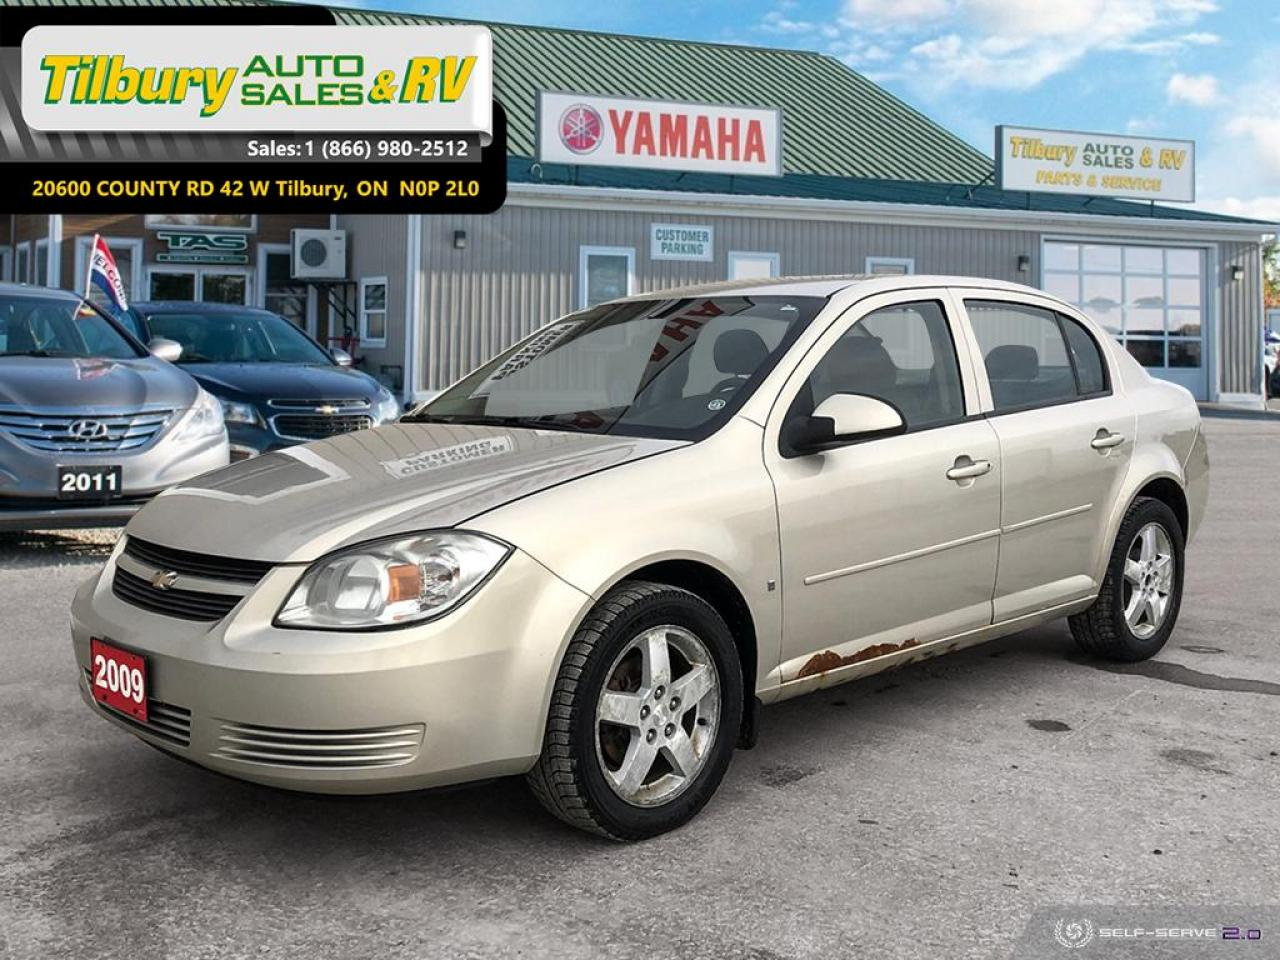 2009 Chevrolet Cobalt LT w/1SA *LOW KM'S*